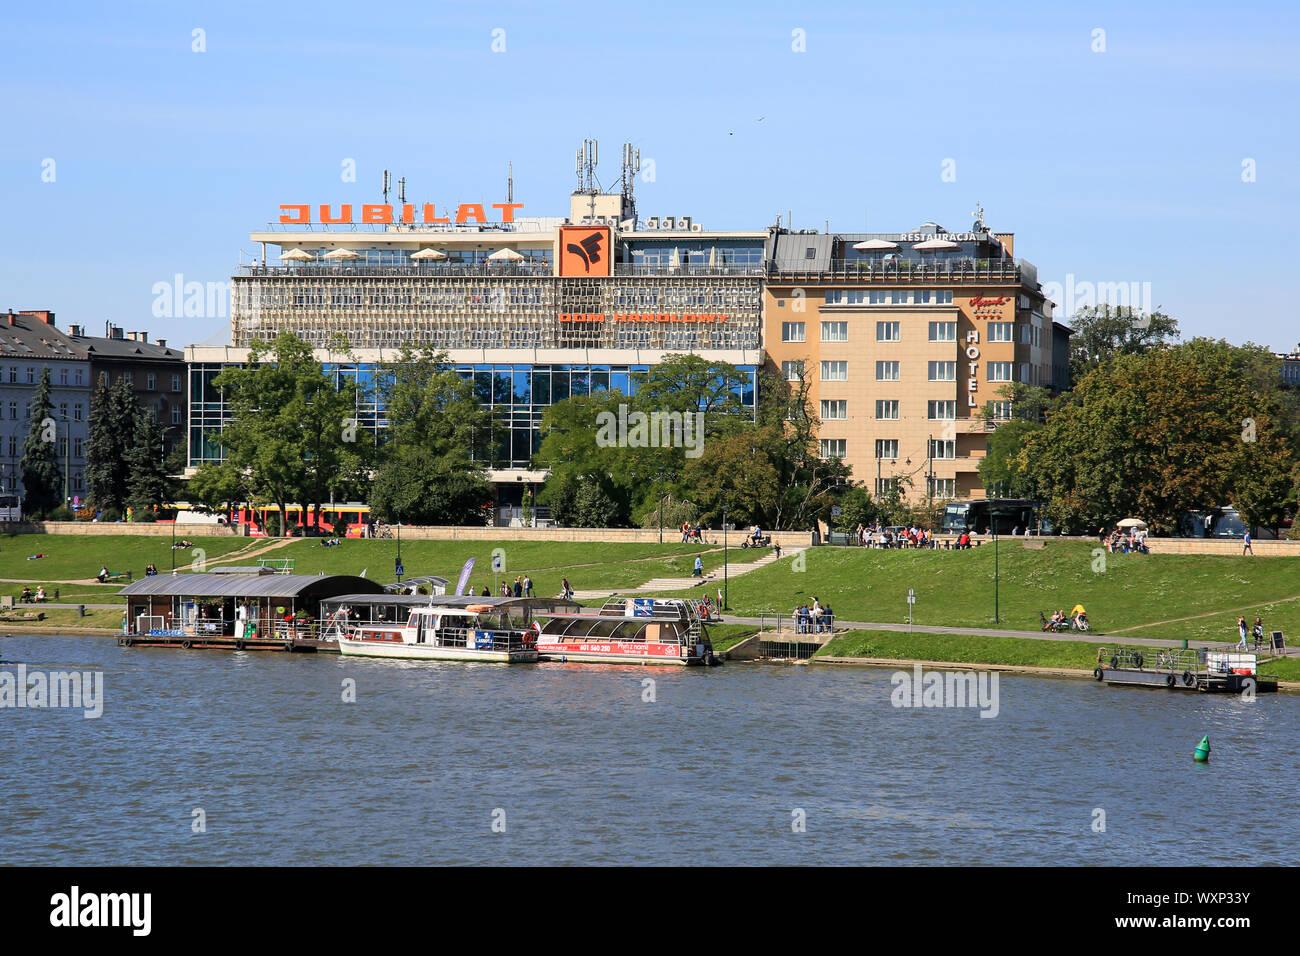 Jubilat Hotel Krakow Poland Stock Photo 274621983 Alamy